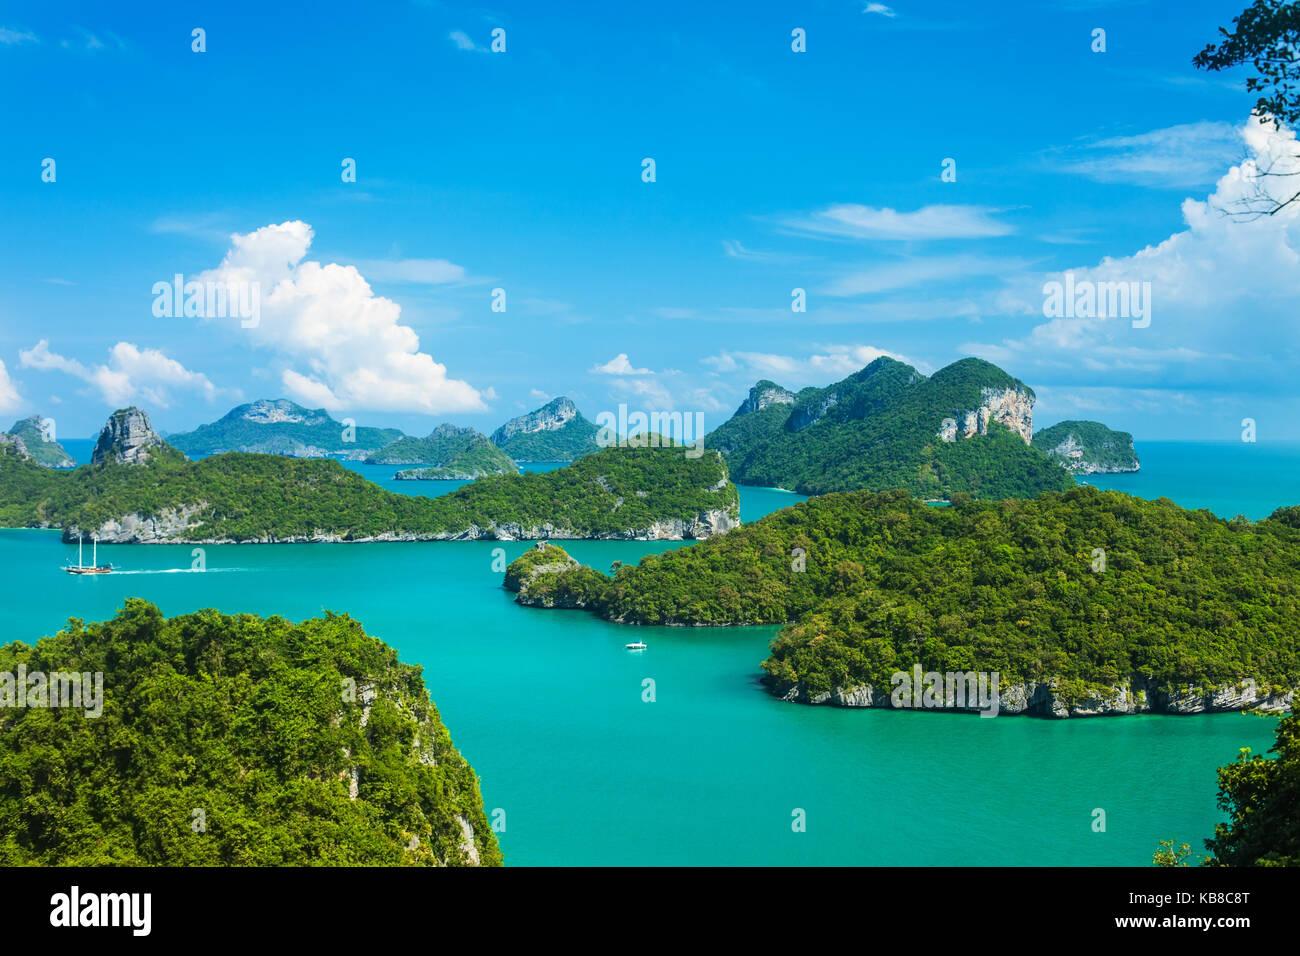 Tropical nel gruppo di isole Ang Thong National Marine Park, Thailandia. Vista superiore Immagini Stock